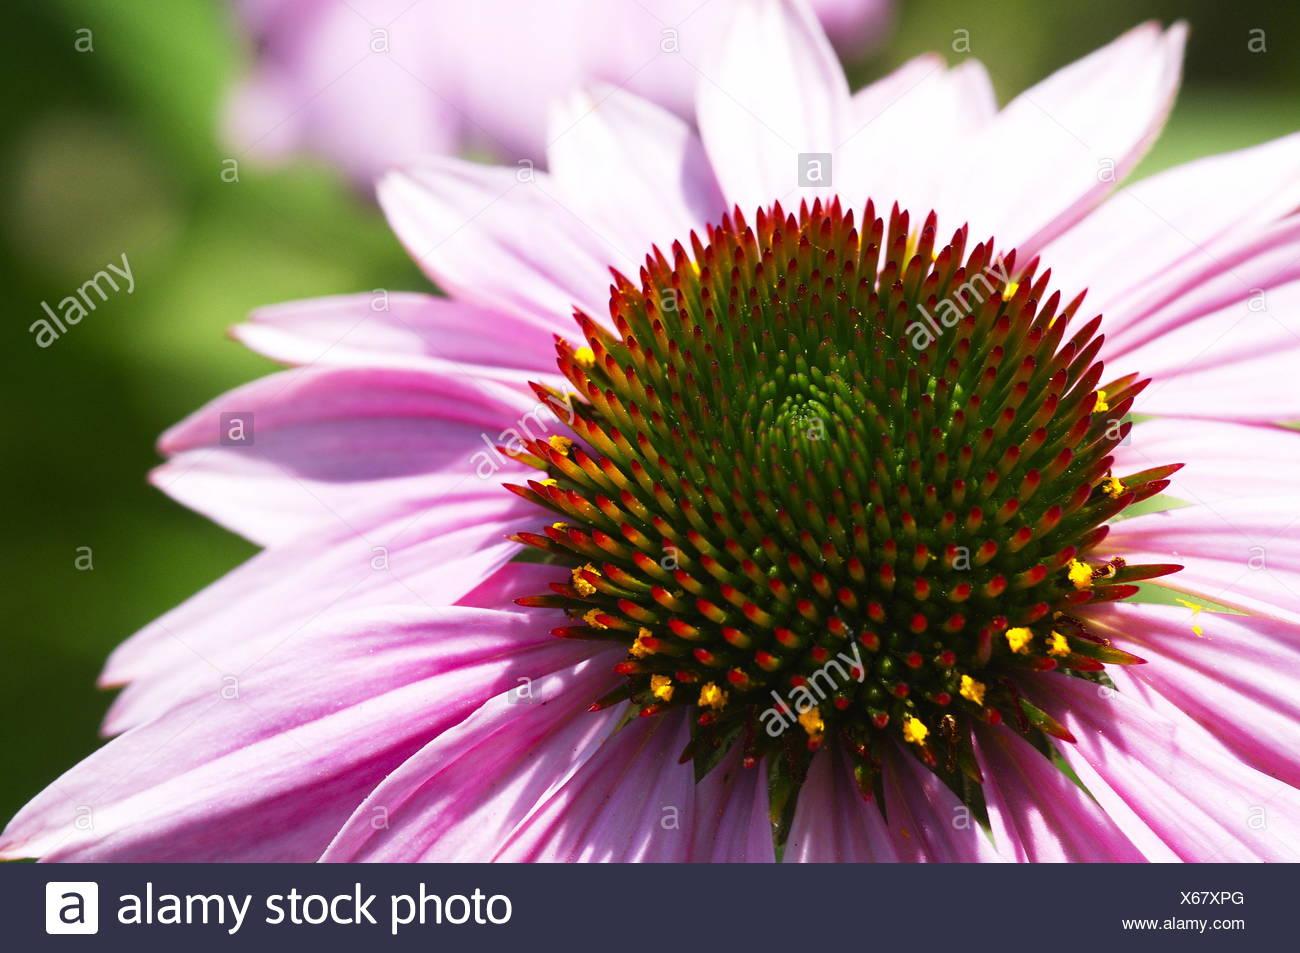 eastern purple coneflower - Stock Image